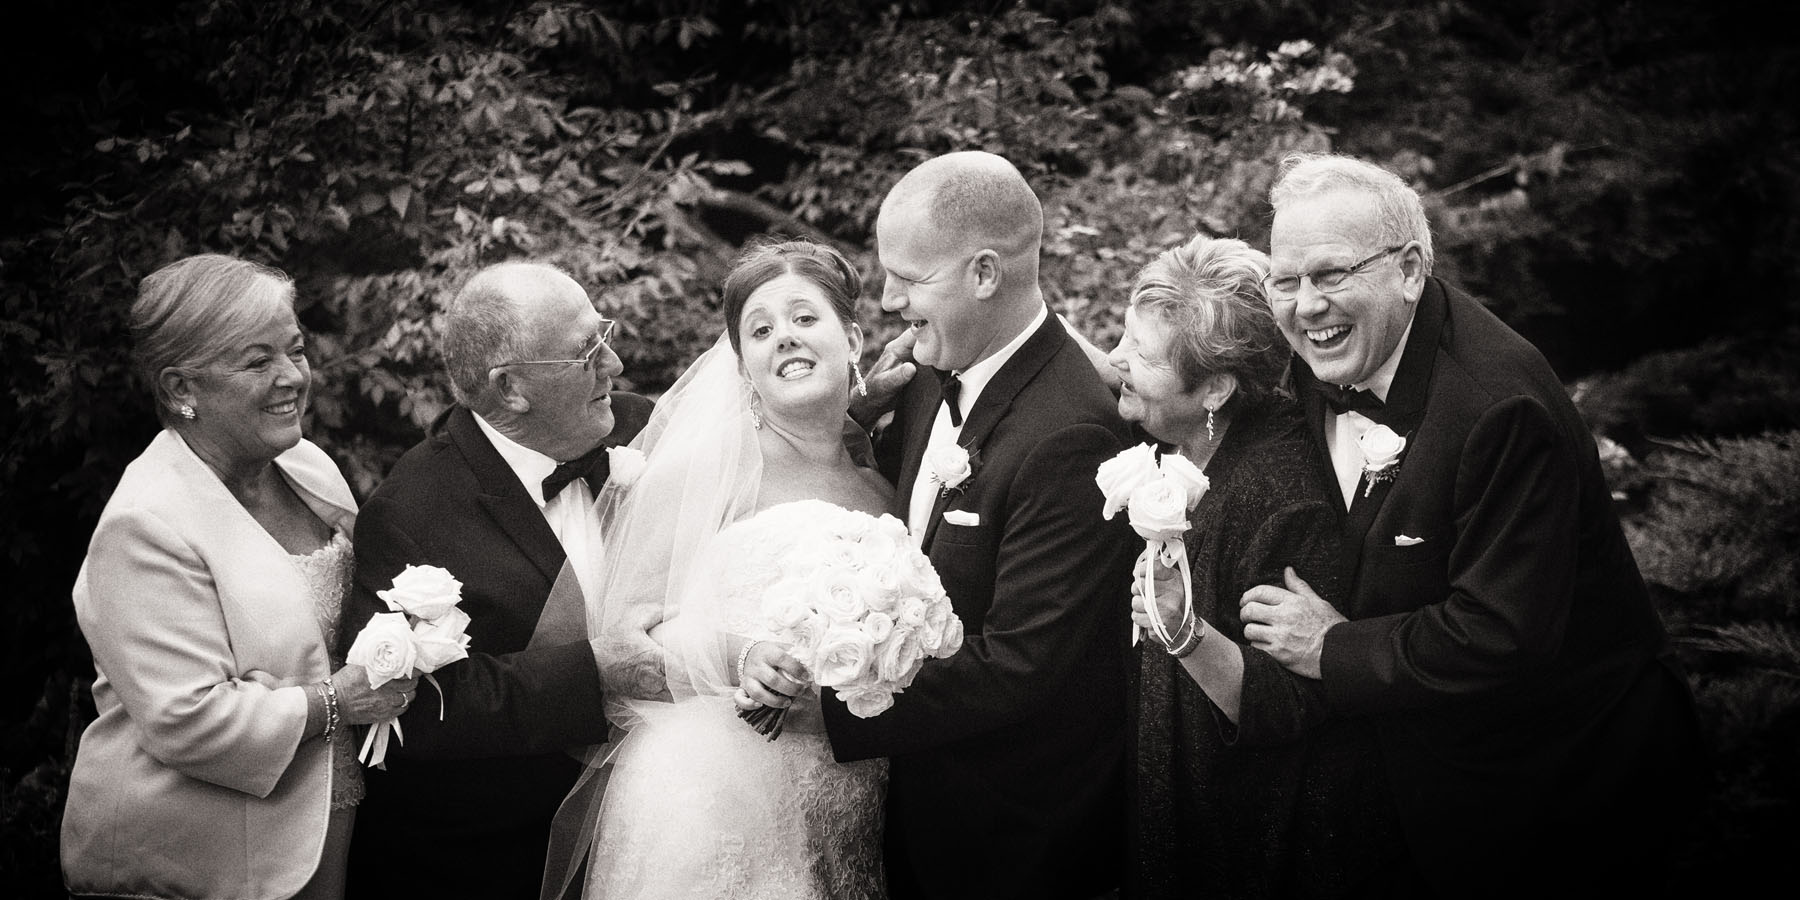 Family Portraits As A Couple